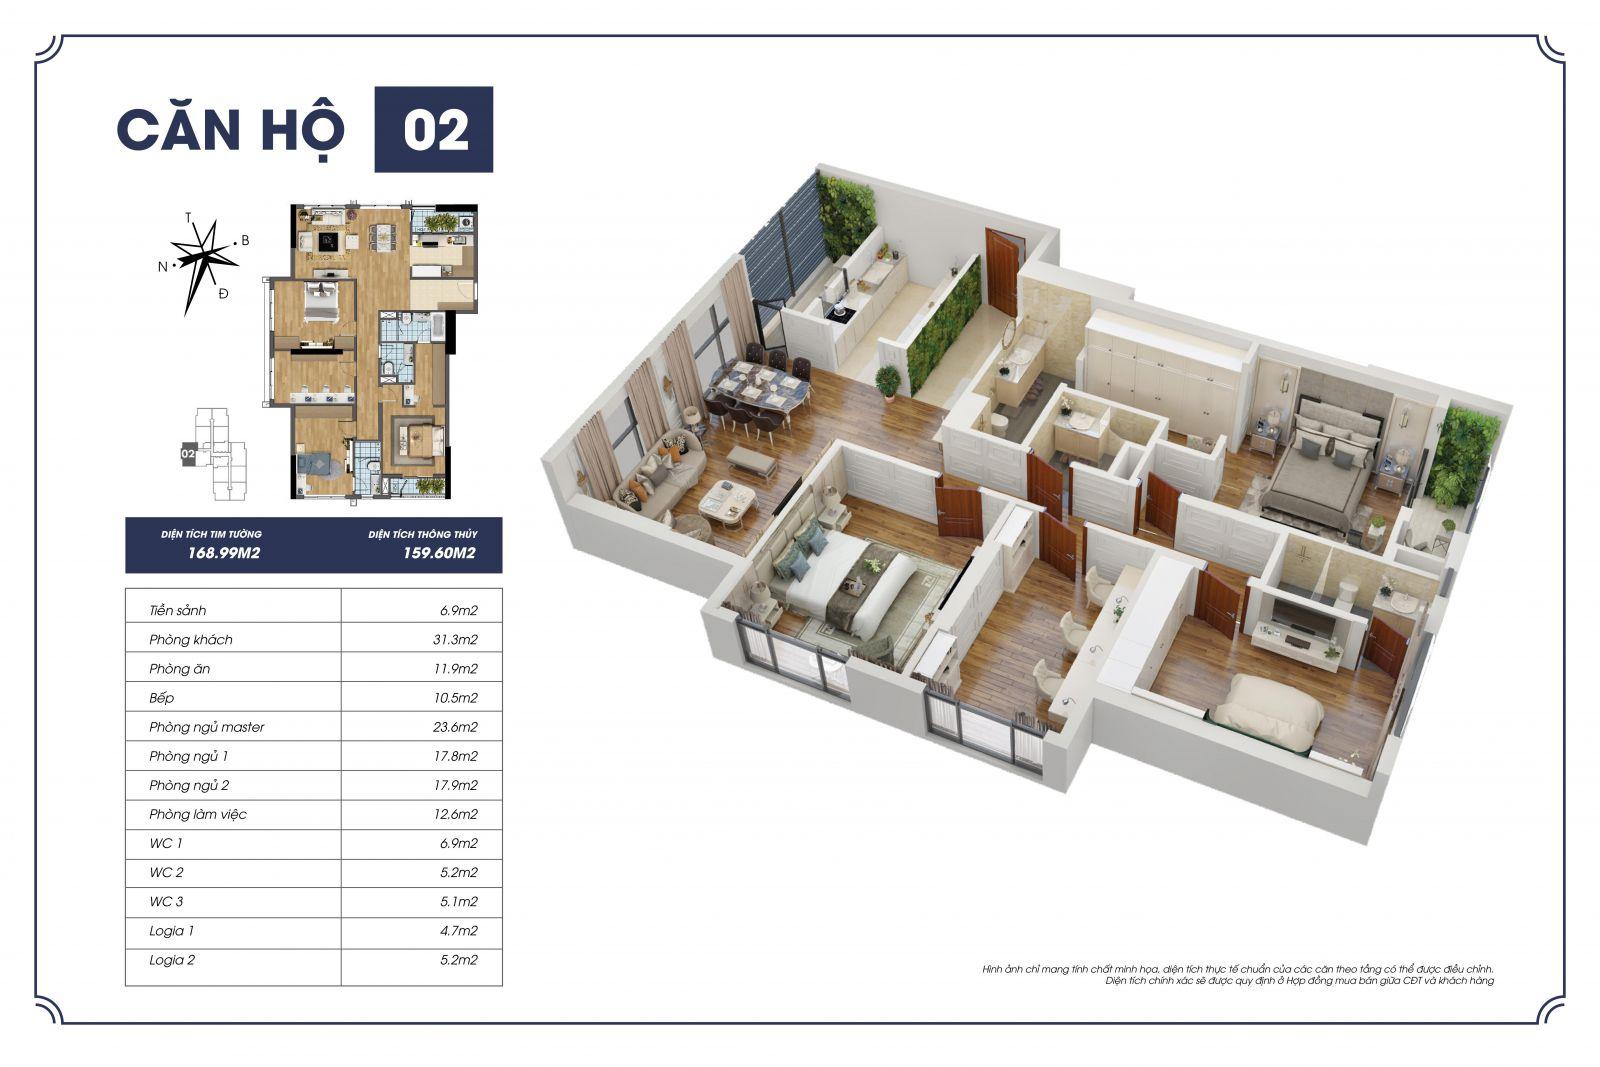 Phối cảnh 3D căn hộ 02 - Sapphire 2